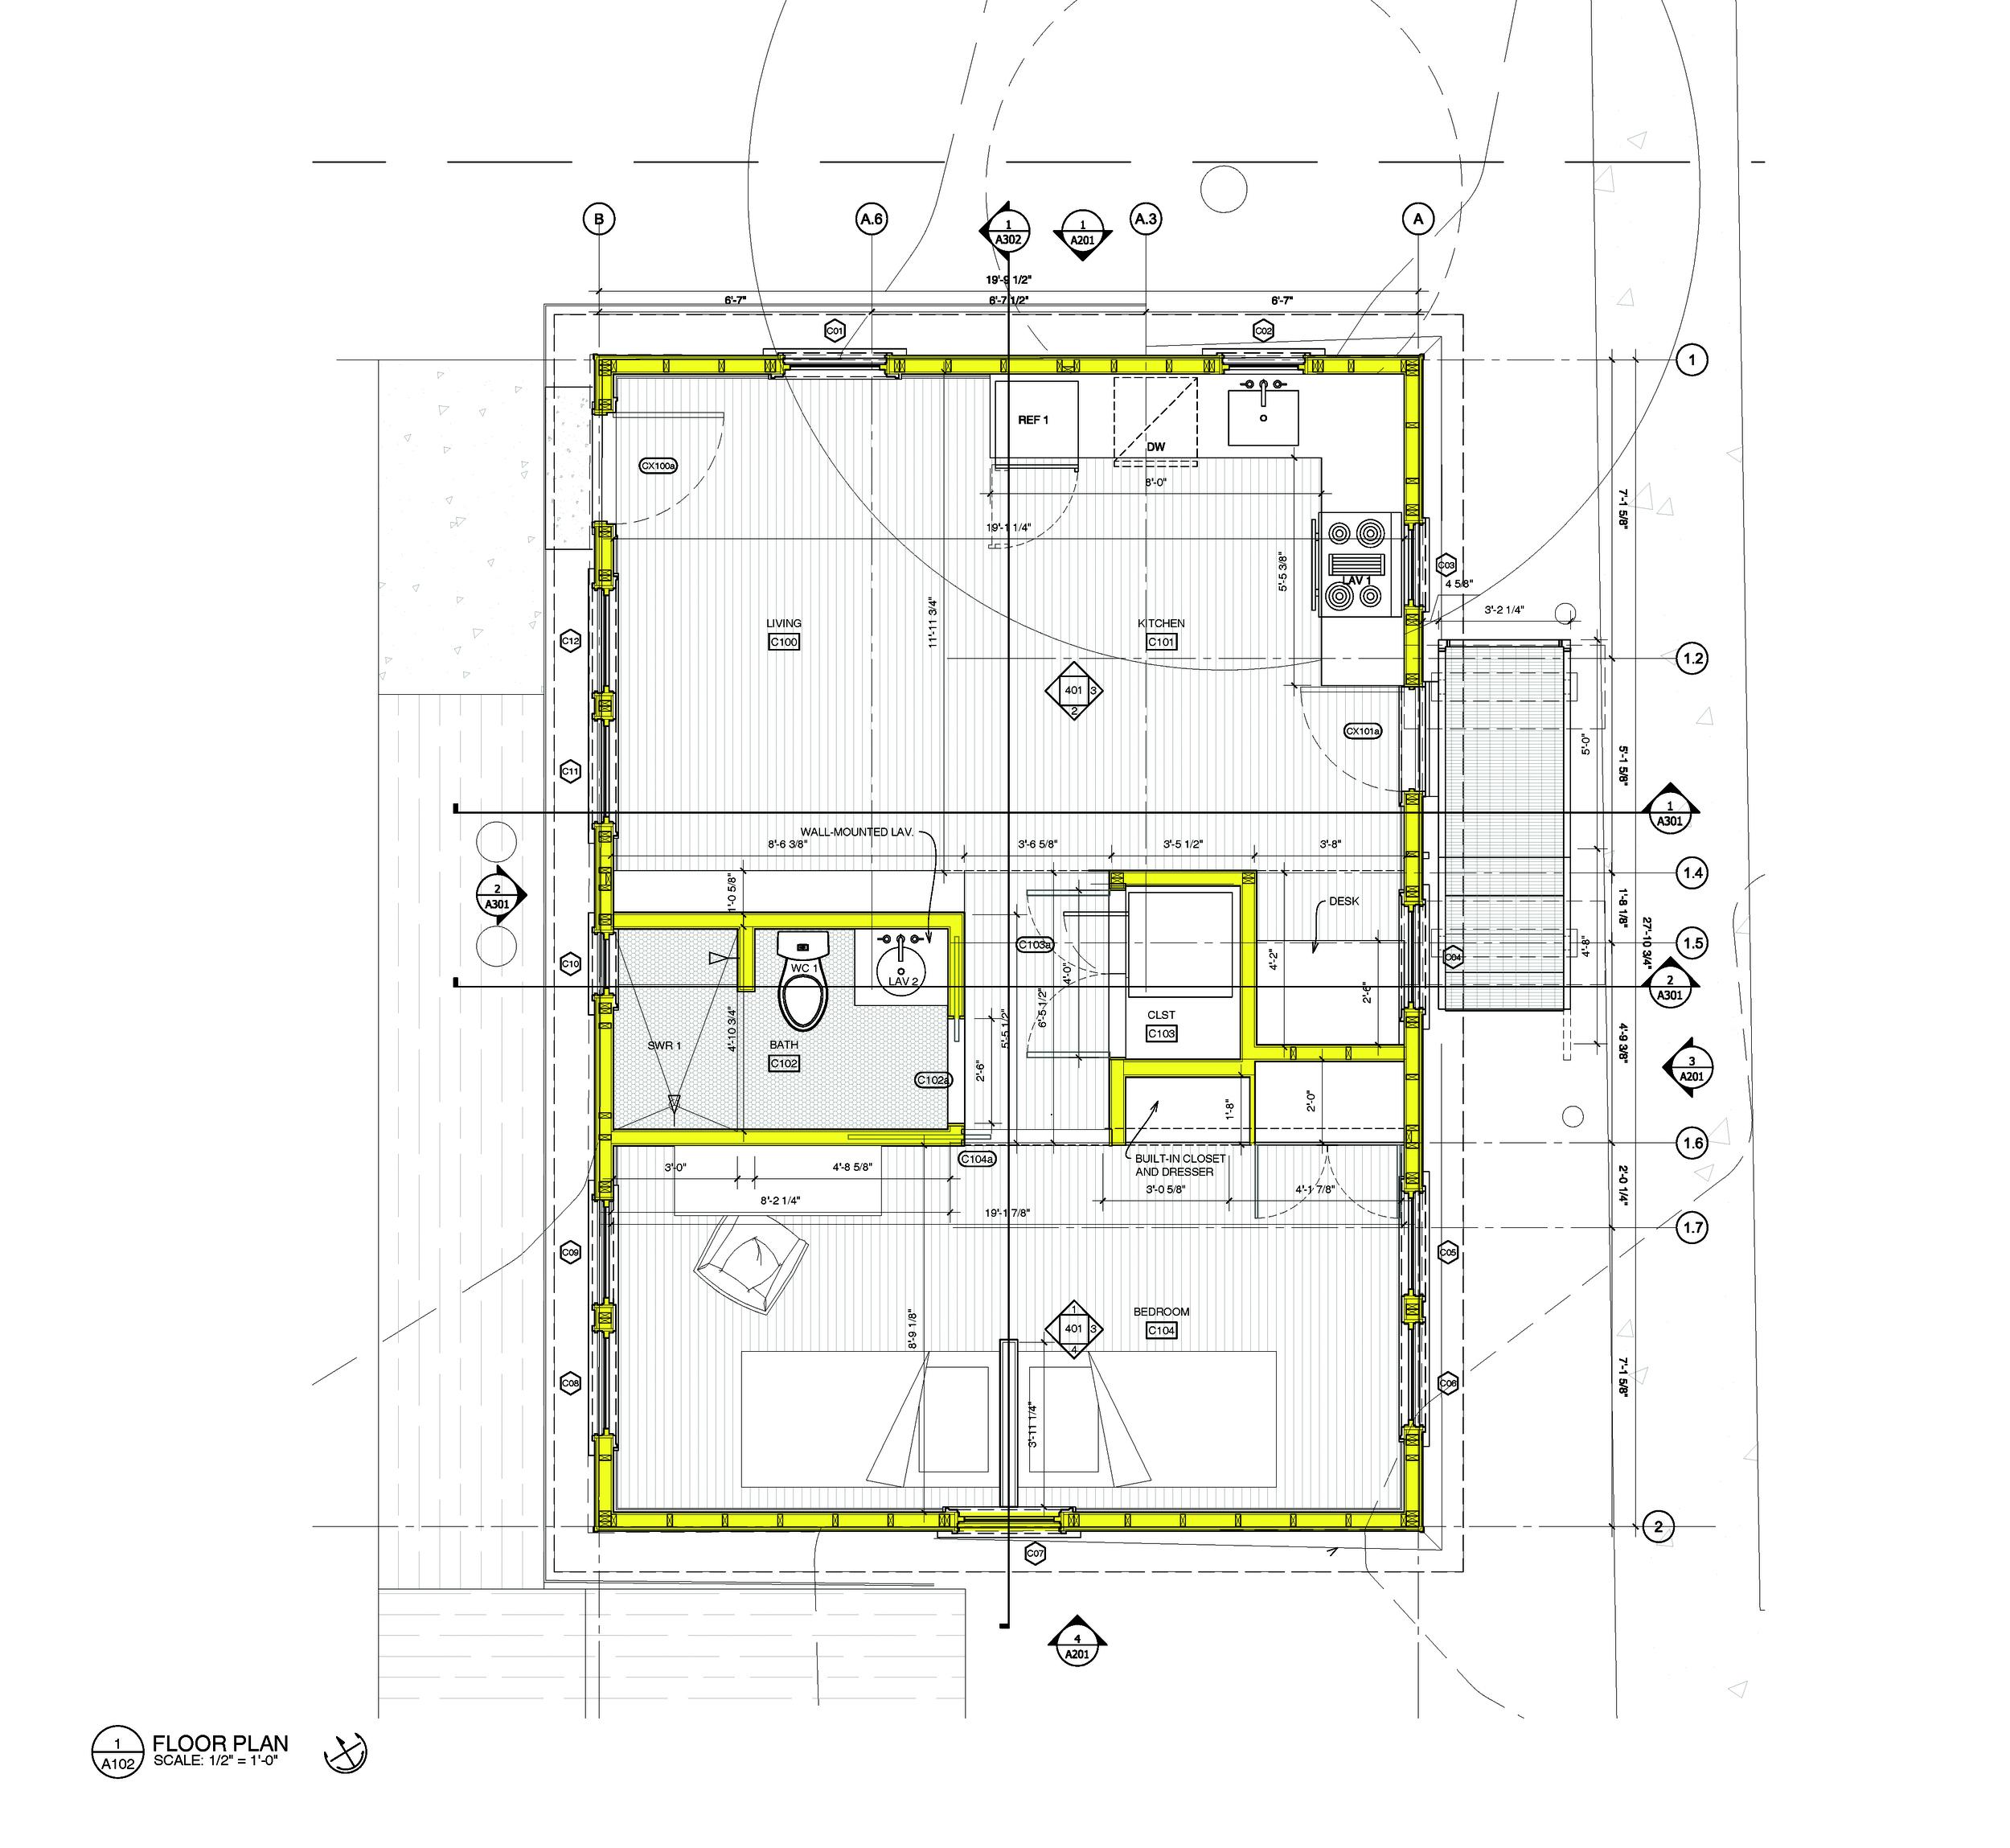 025_HY_2015_02_Guest+House_plan.jpg